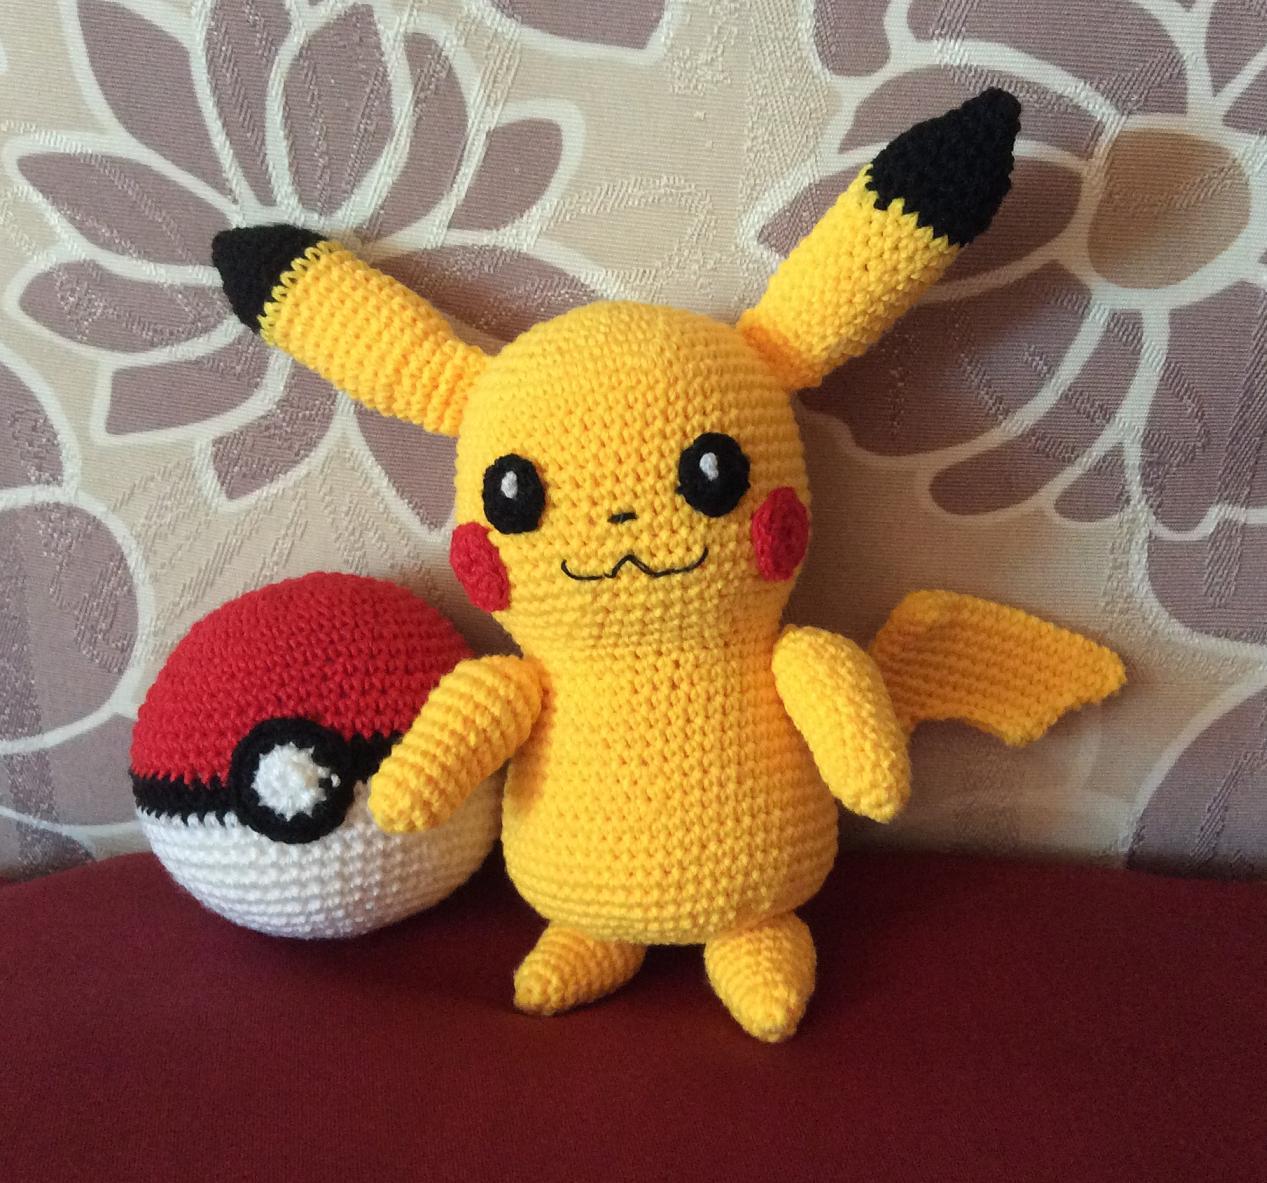 15 Creative Crochet Pokemon Patterns Free ⋆ DIY Crafts | 1183x1267